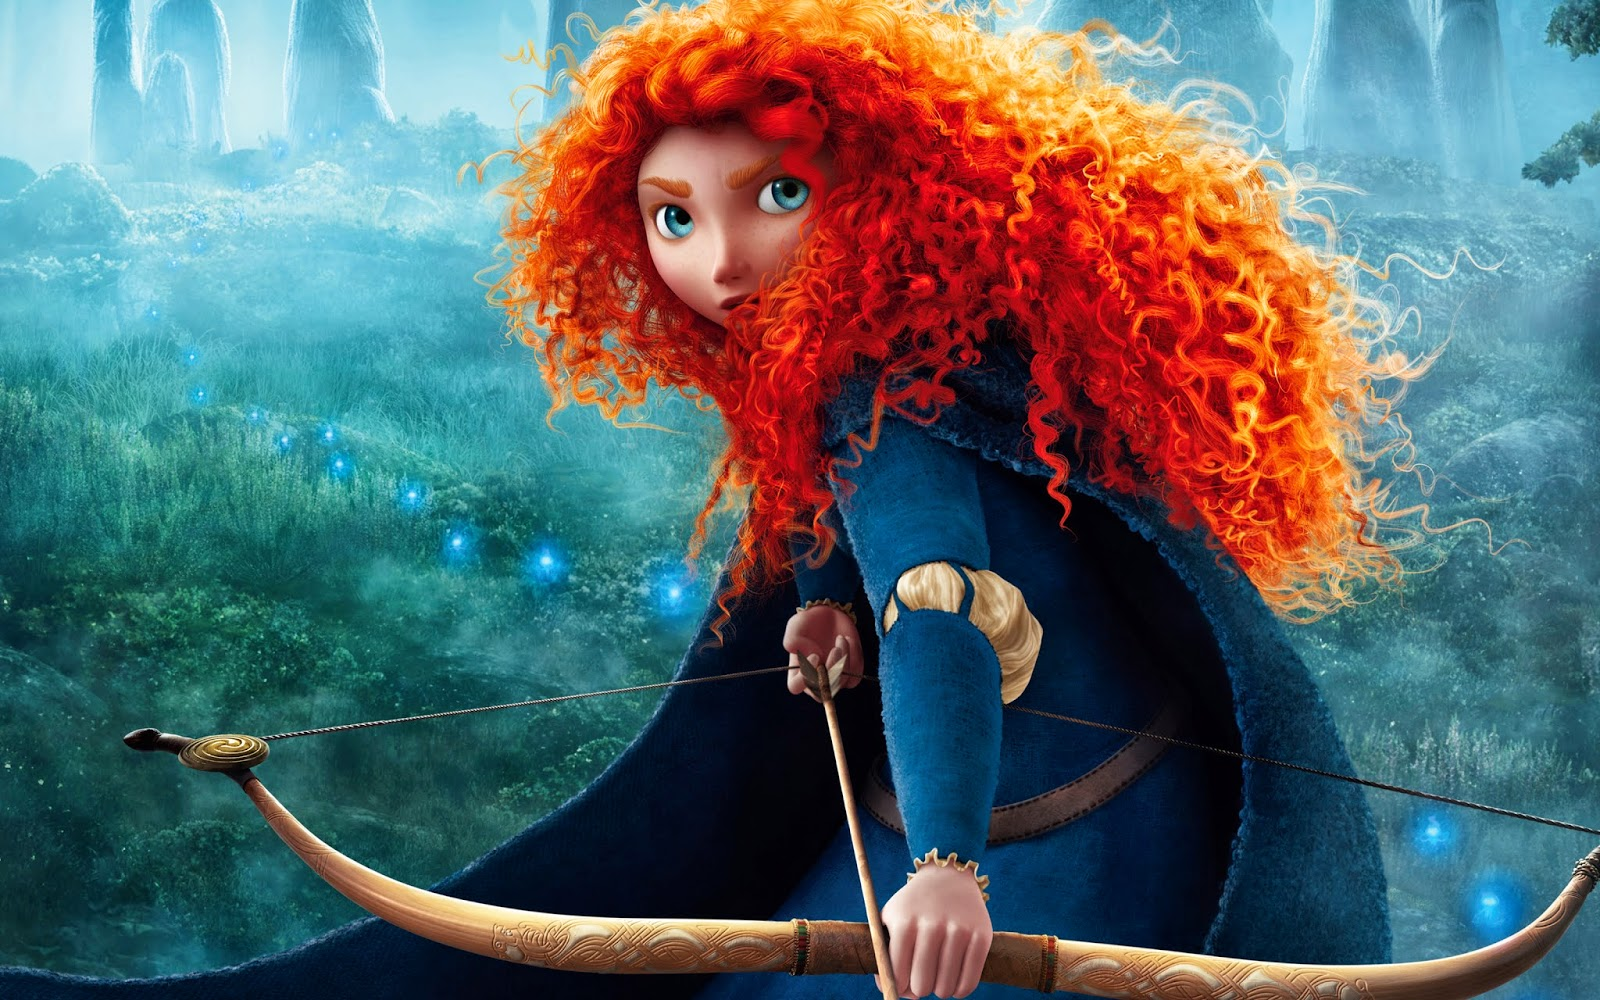 Curly Hair Curly Hair Merida Curly Hair Story